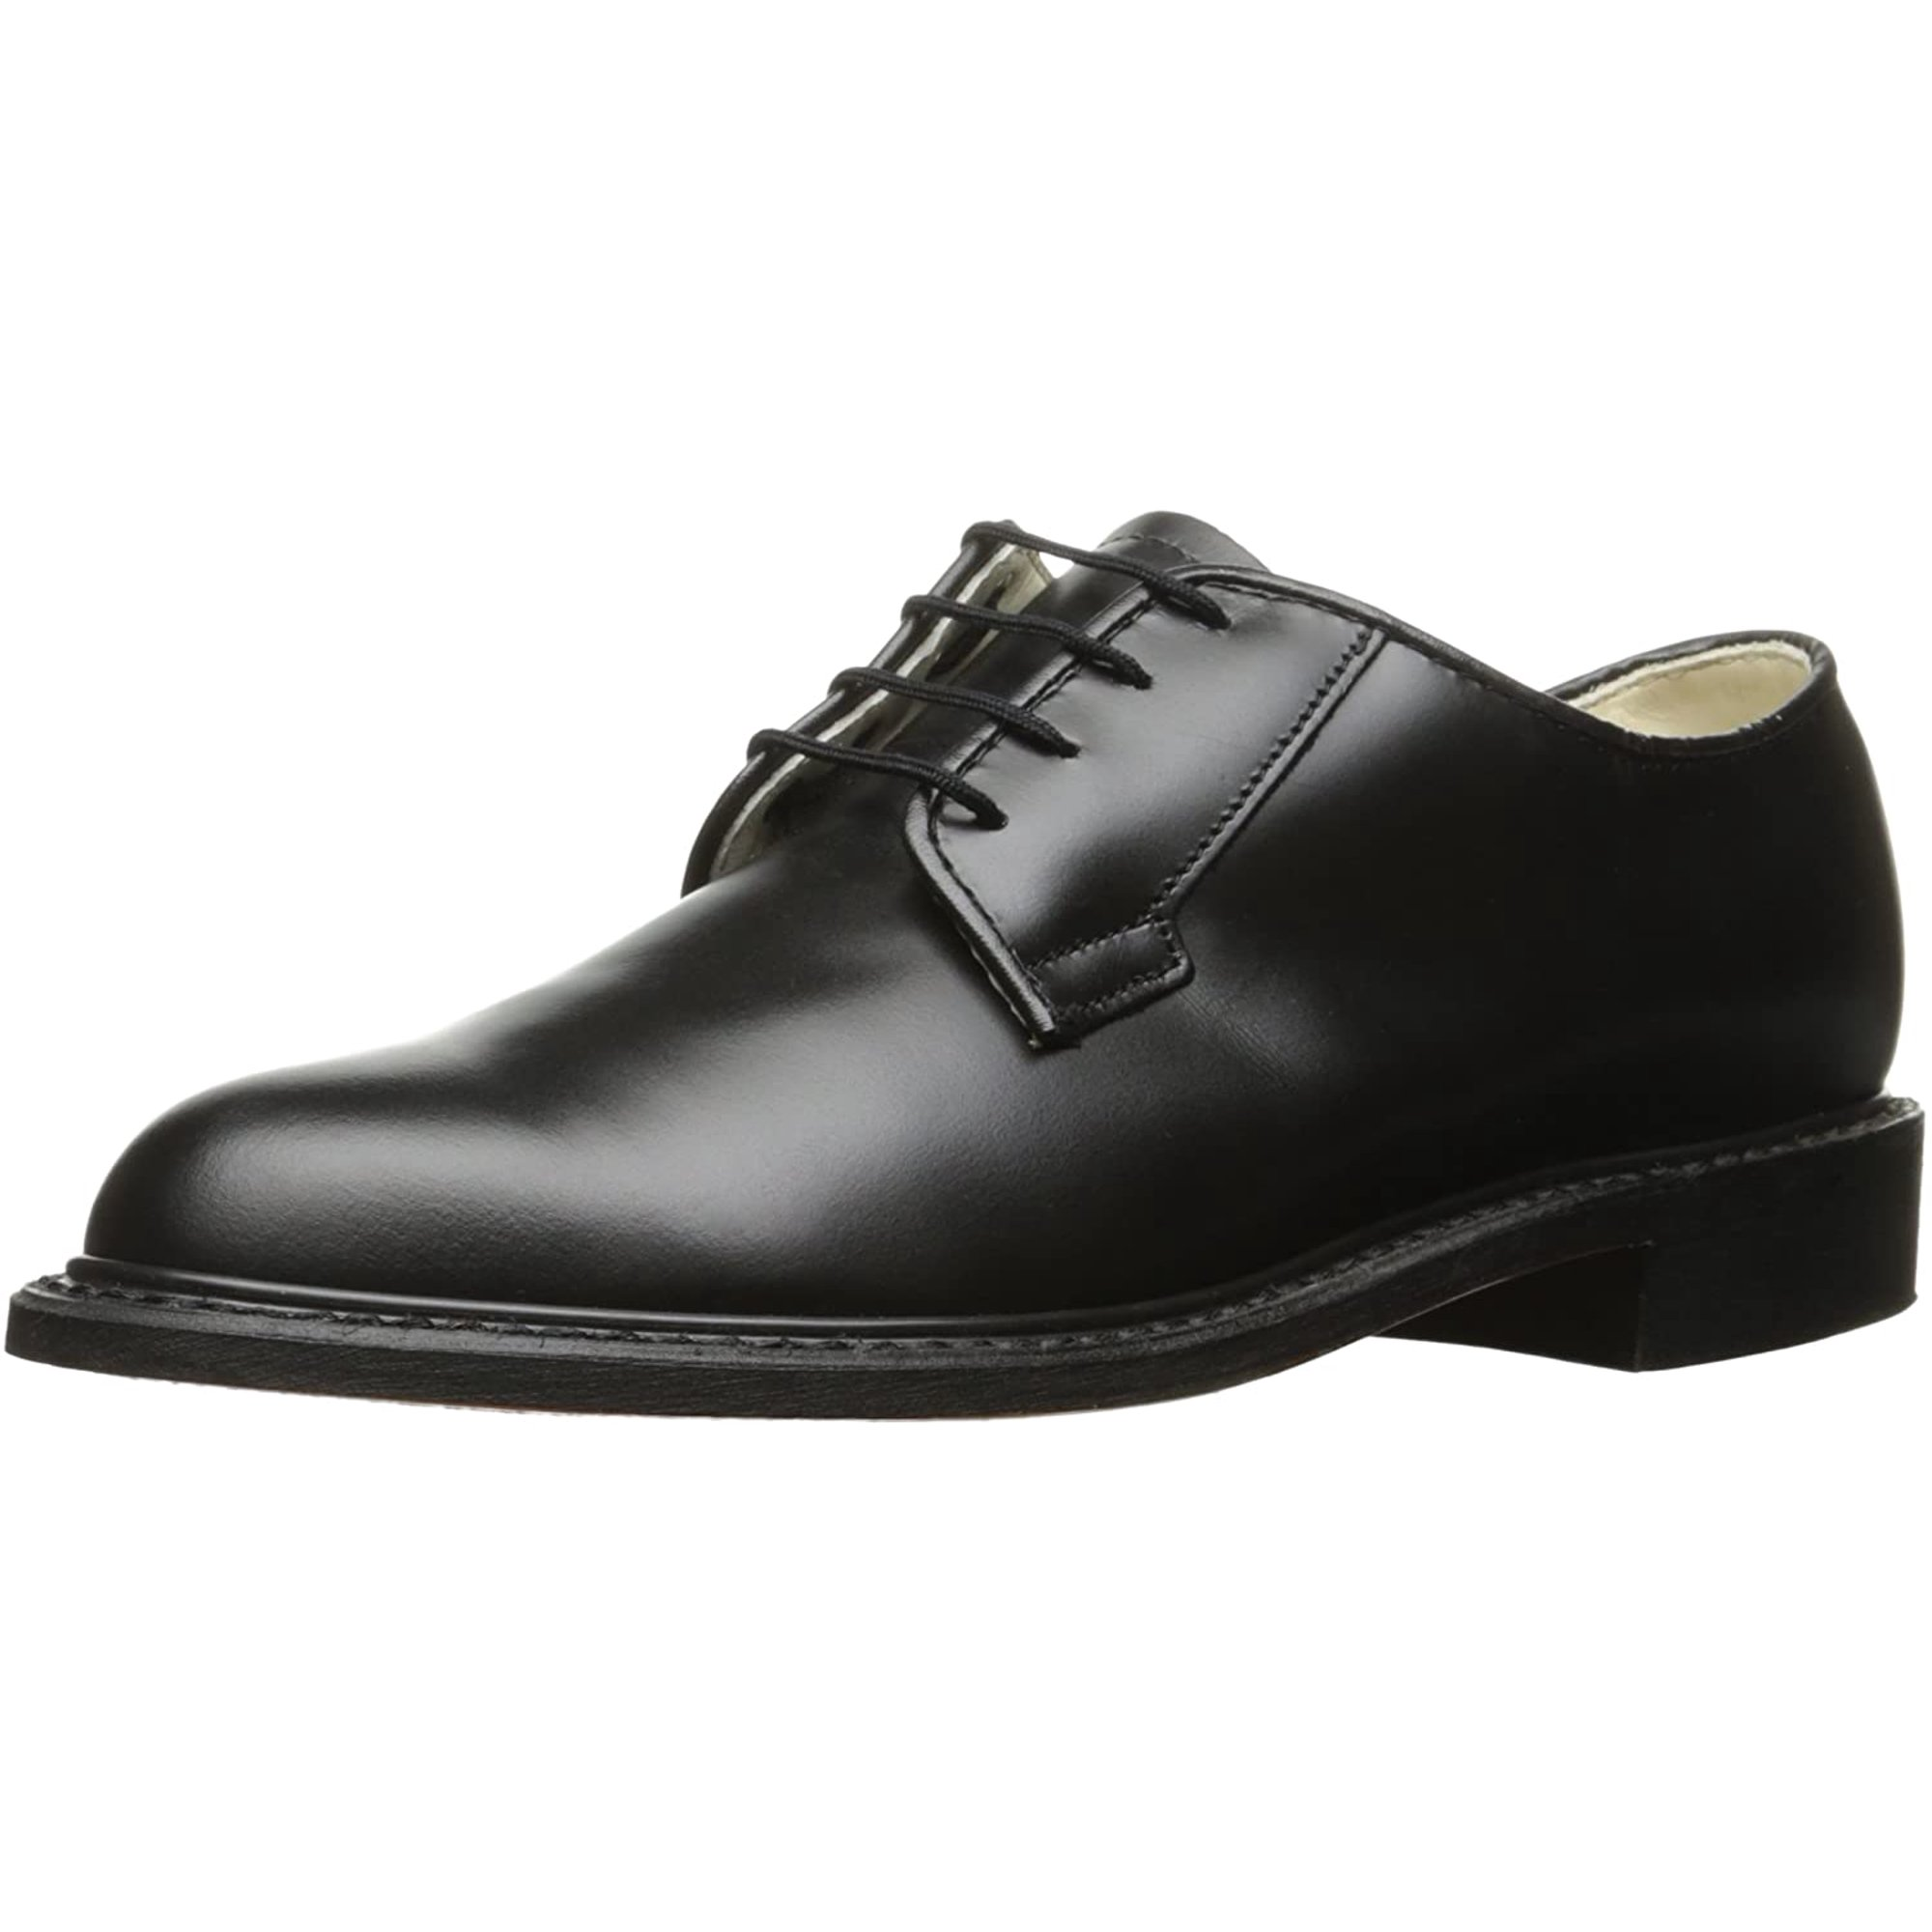 Bates Women's Navy Premier Oxford Uniform Dress Shoe, Black, 8 M US |  Walmart Canada